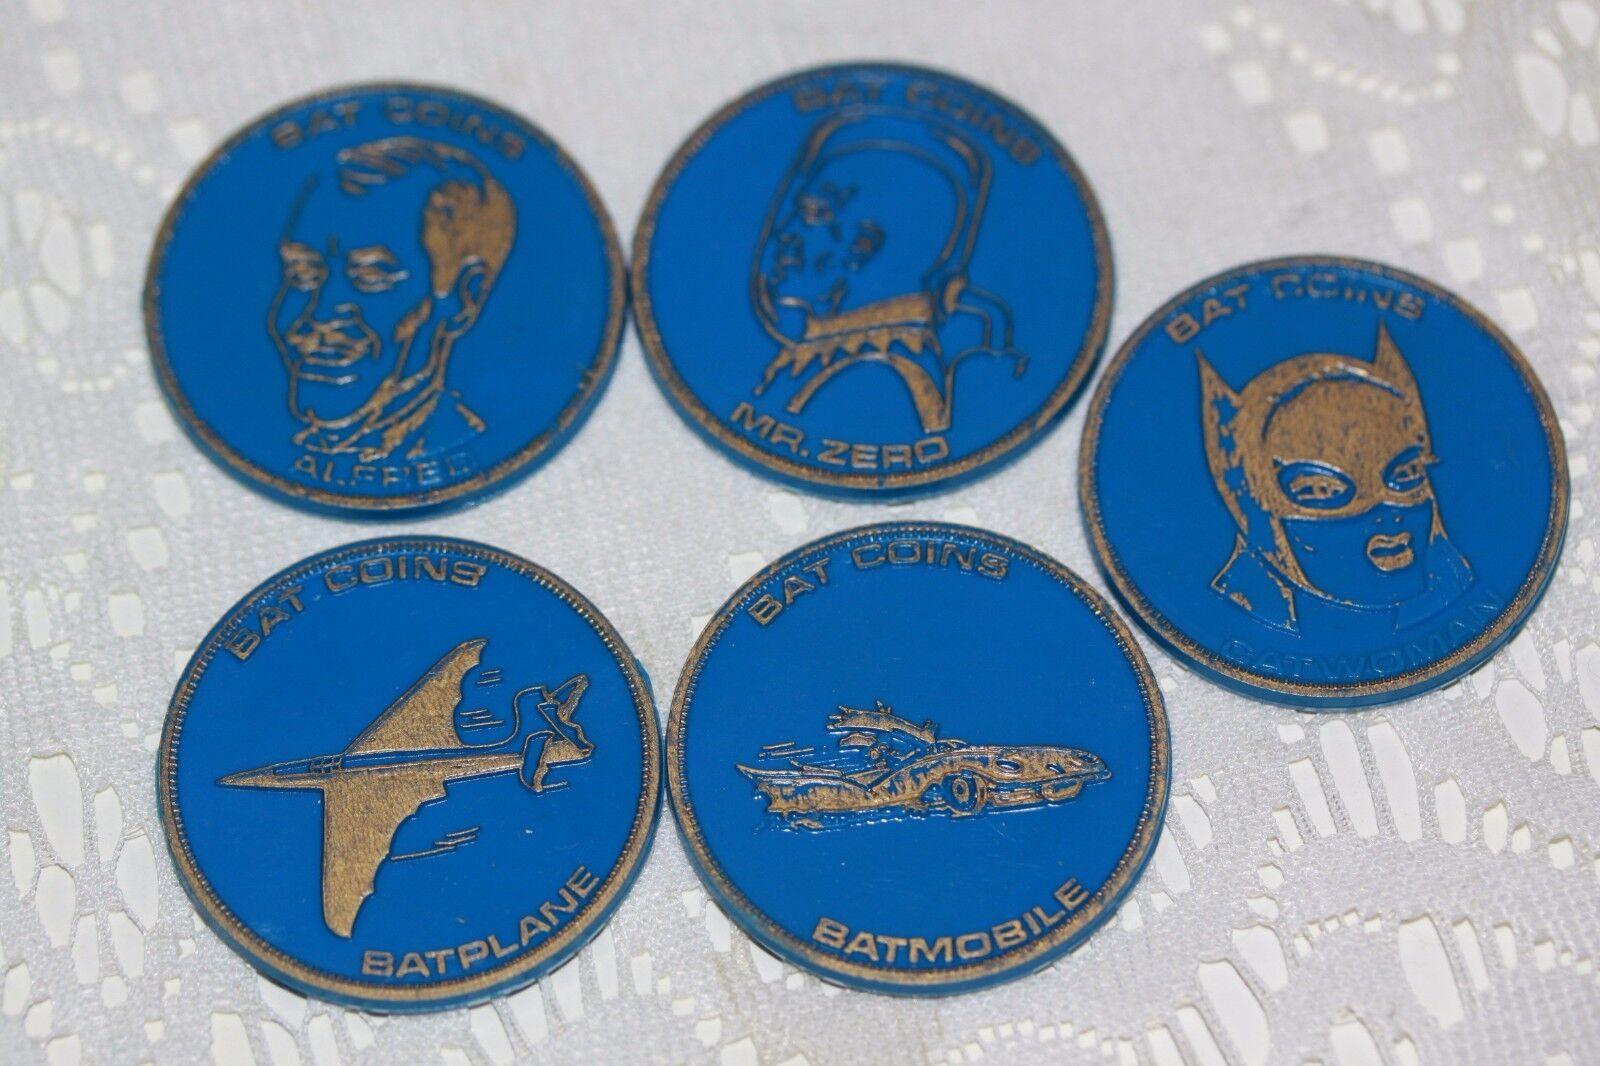 1966 BATMAN LOT OF 5 5 5 BAT COIN COINS BATPLANE ALFRED CATWOMAN MR ZERO blueE 3af677